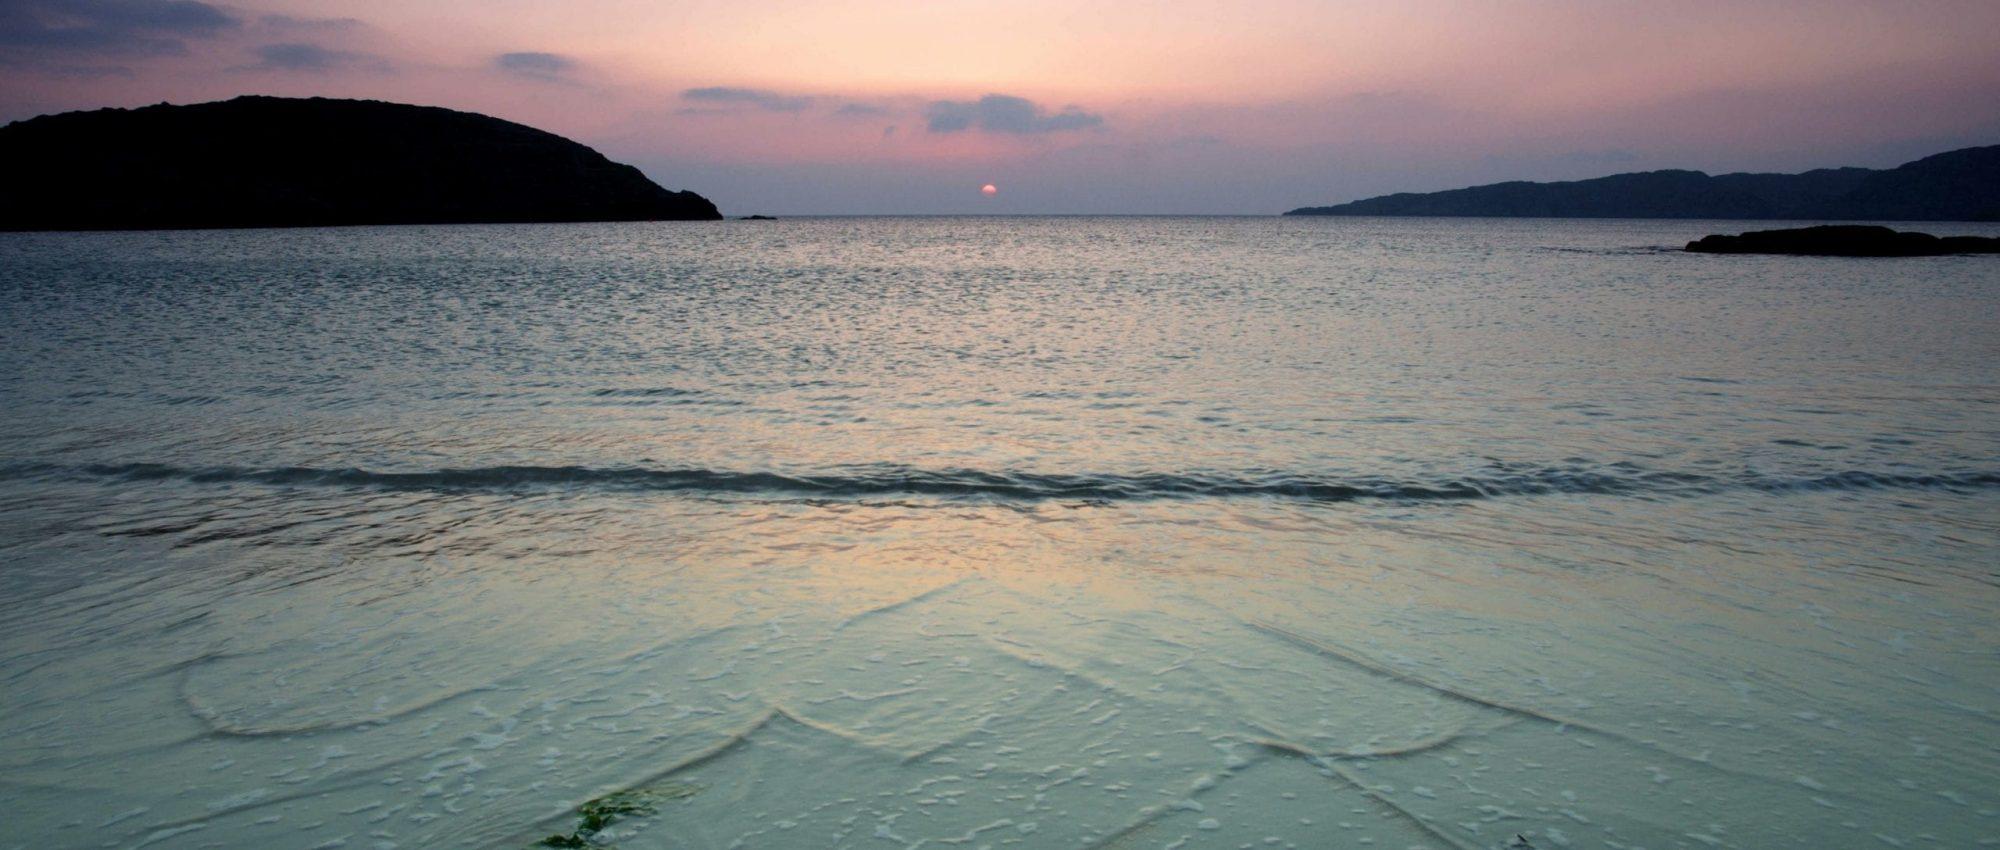 Achmelvich Beach Sunset